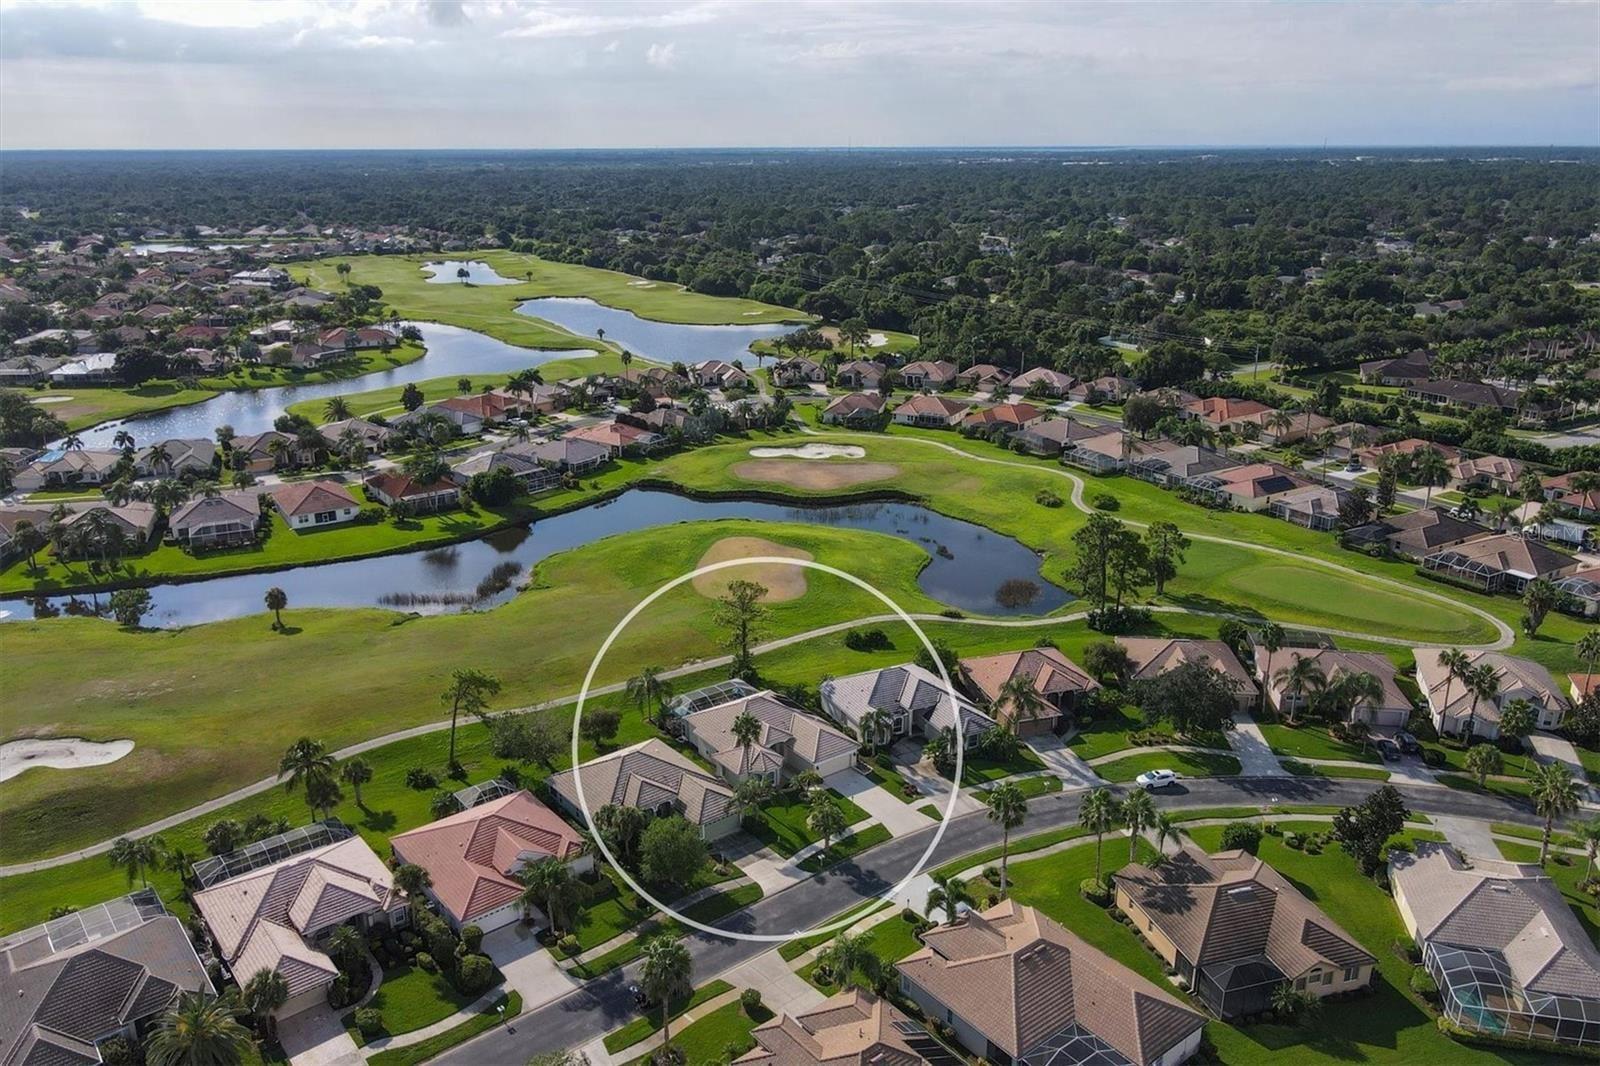 Photo of 2900 PHOENIX PALM TERRACE, NORTH PORT, FL 34288 (MLS # D6121089)